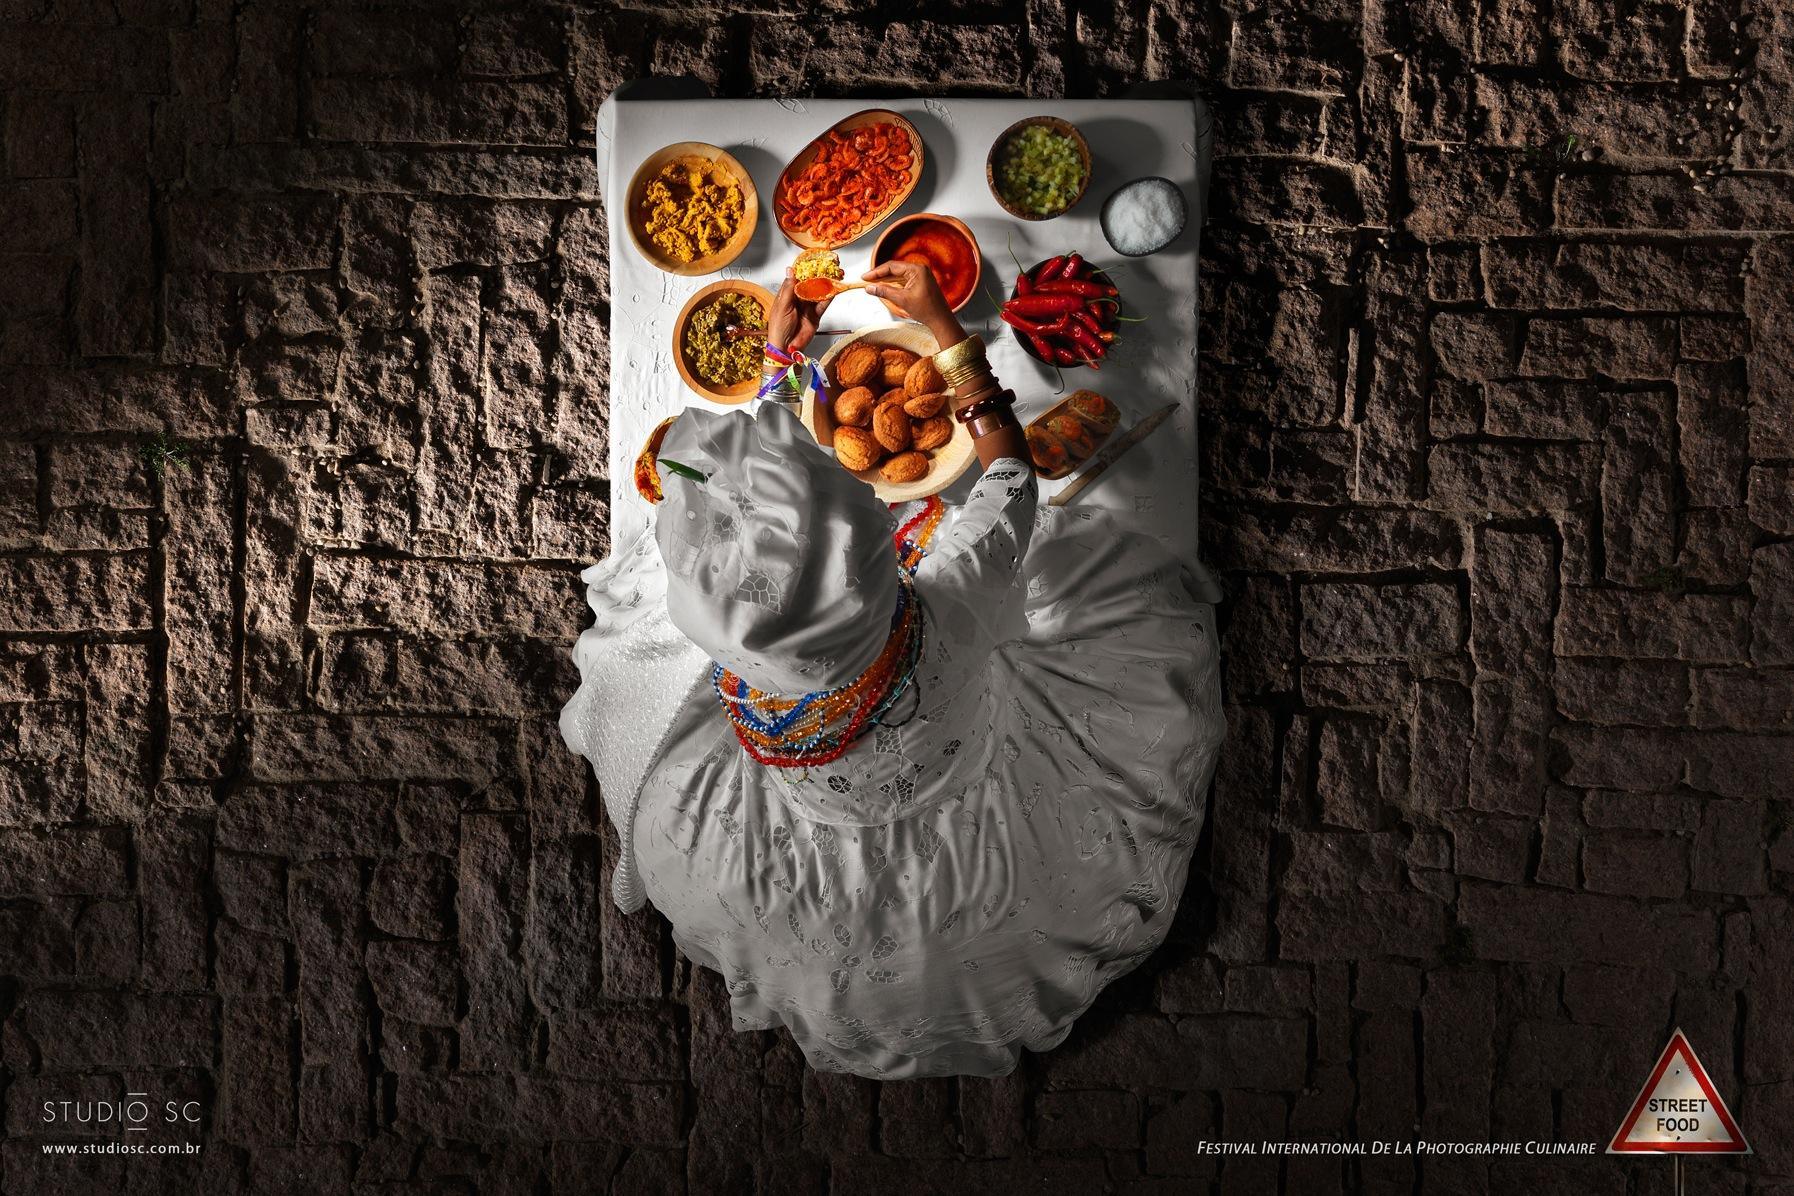 Festival International de la Photographie Culinaire Print Ad -  Street Food, 1